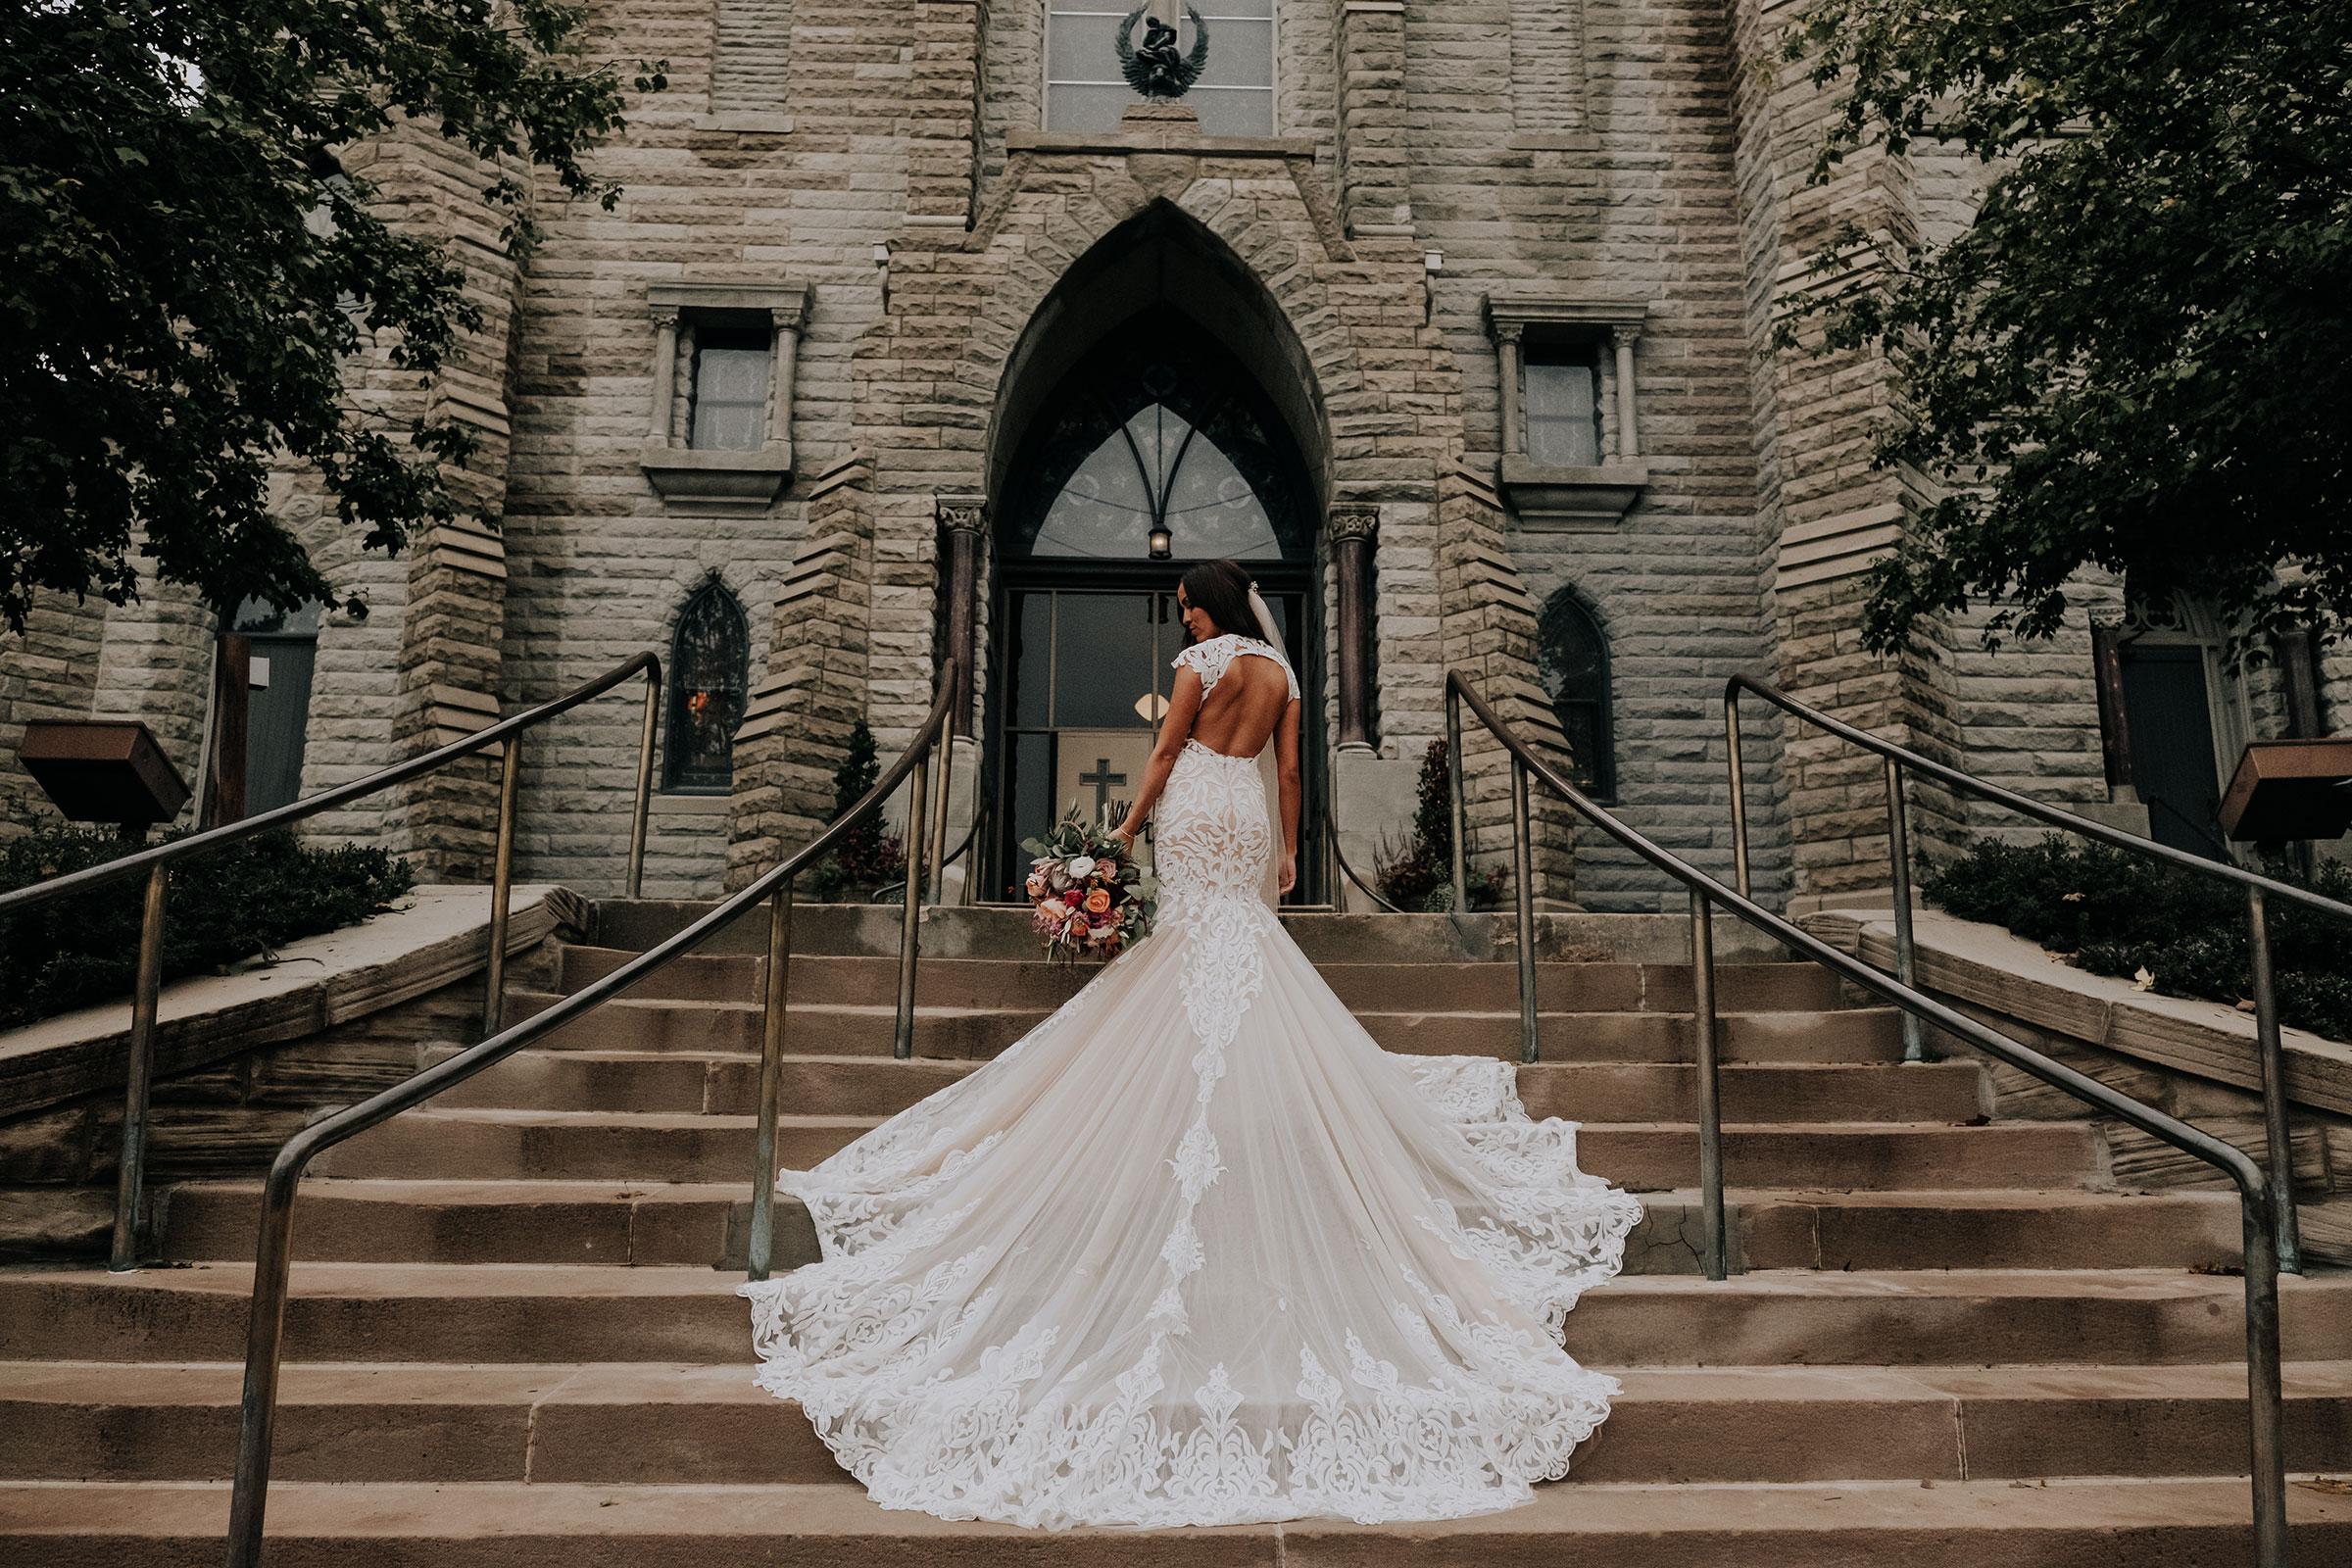 bride-posing-on-stairs-at-st-johns-church-at-creighton-omaha-nebraska-raelyn-ramey-photography.jpg